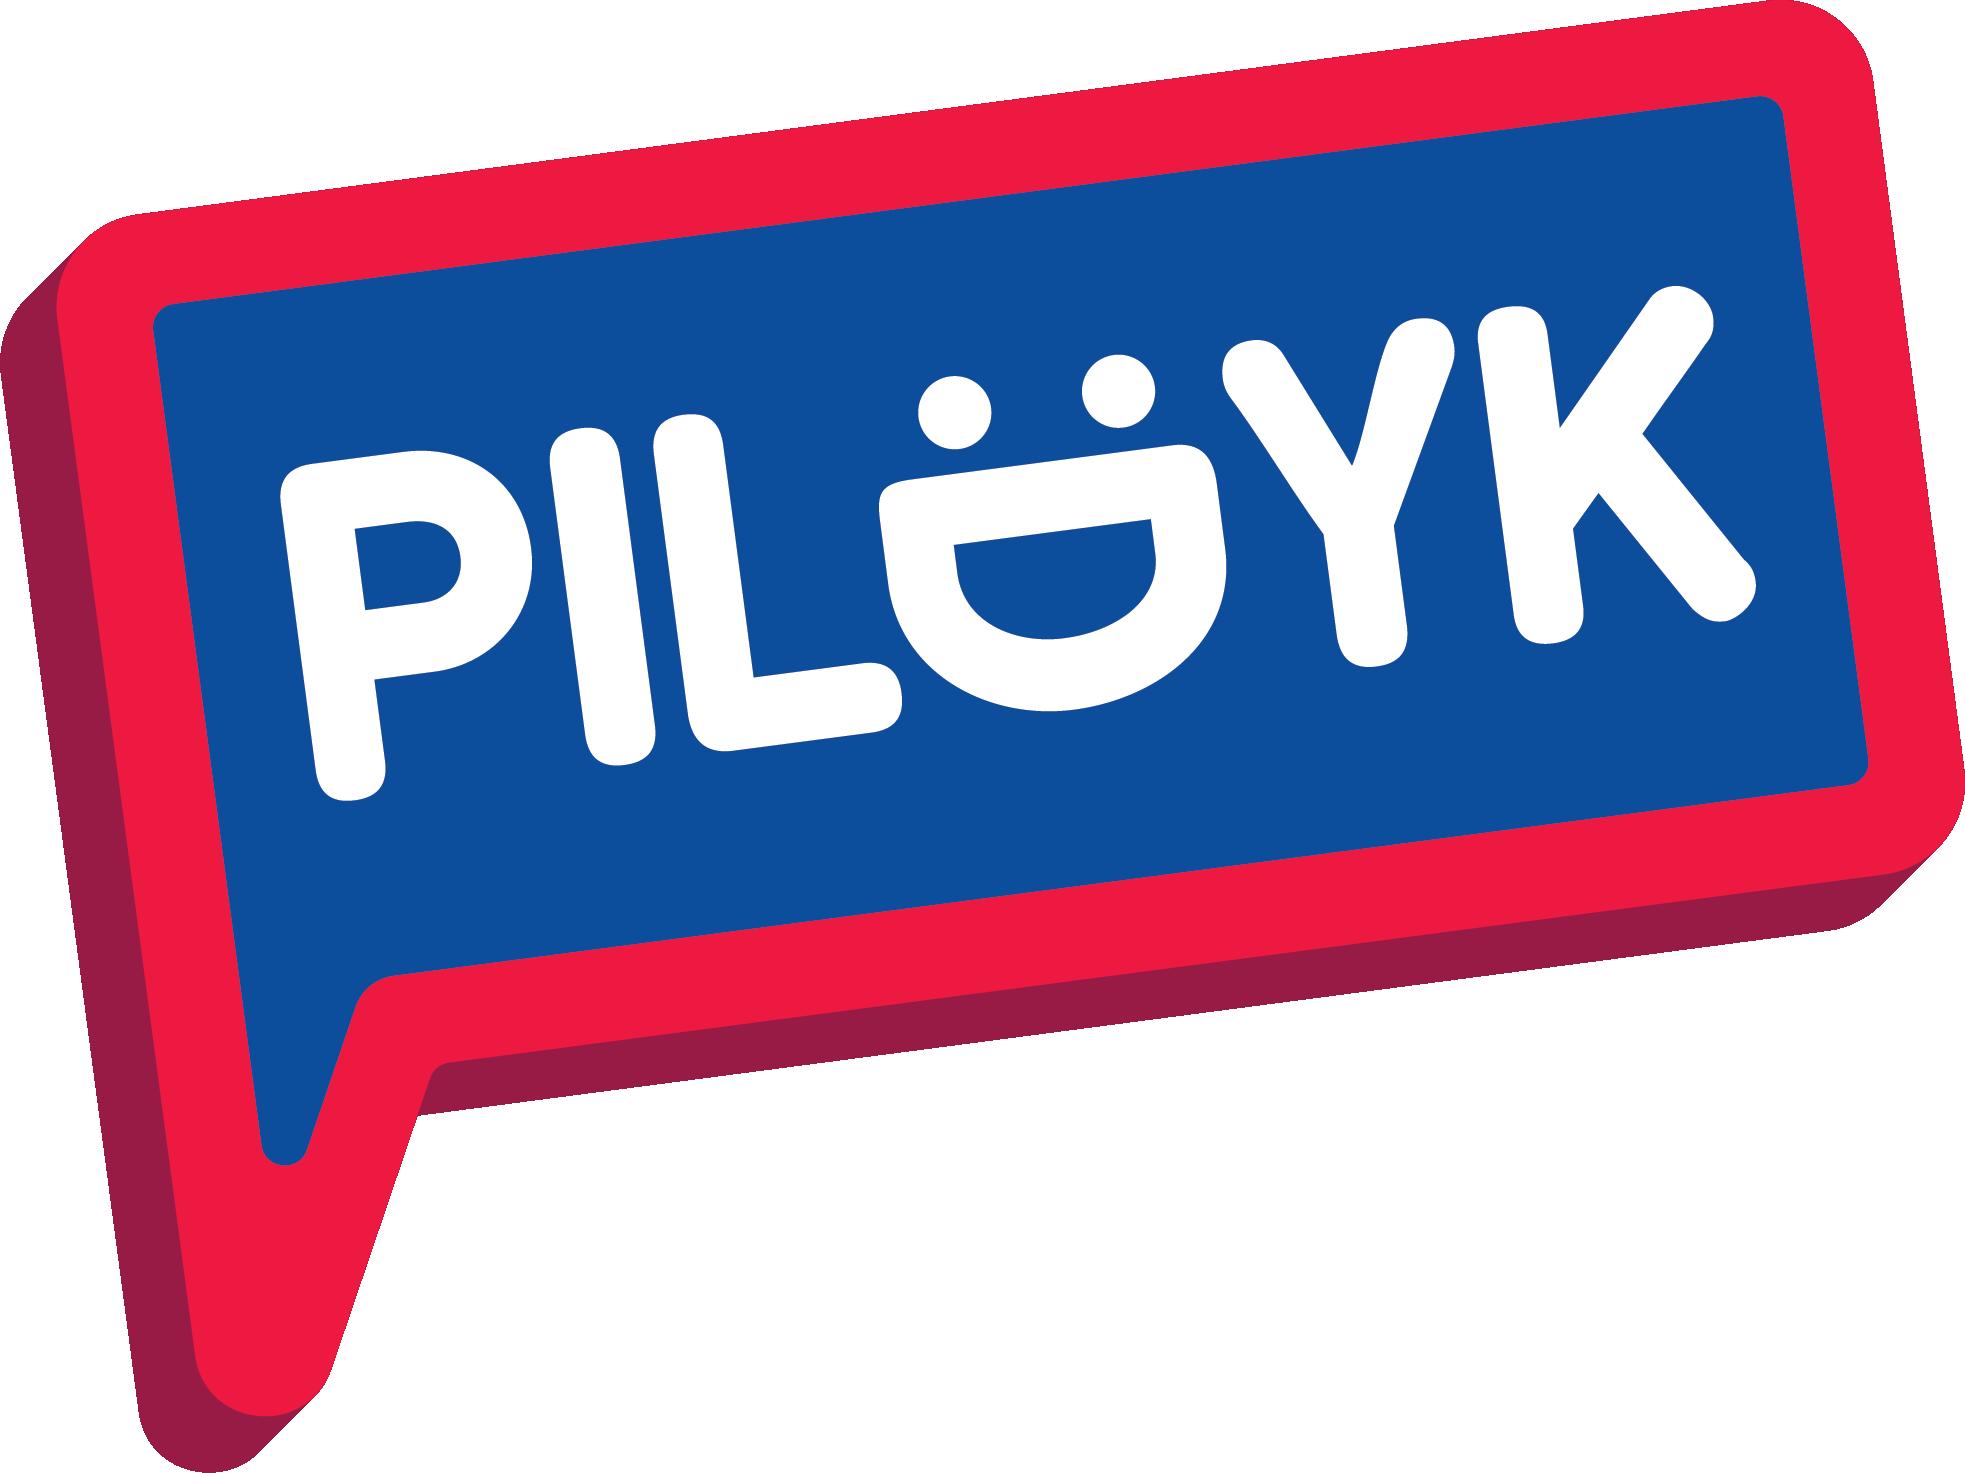 2019_PILDYK logo_CMYK_1